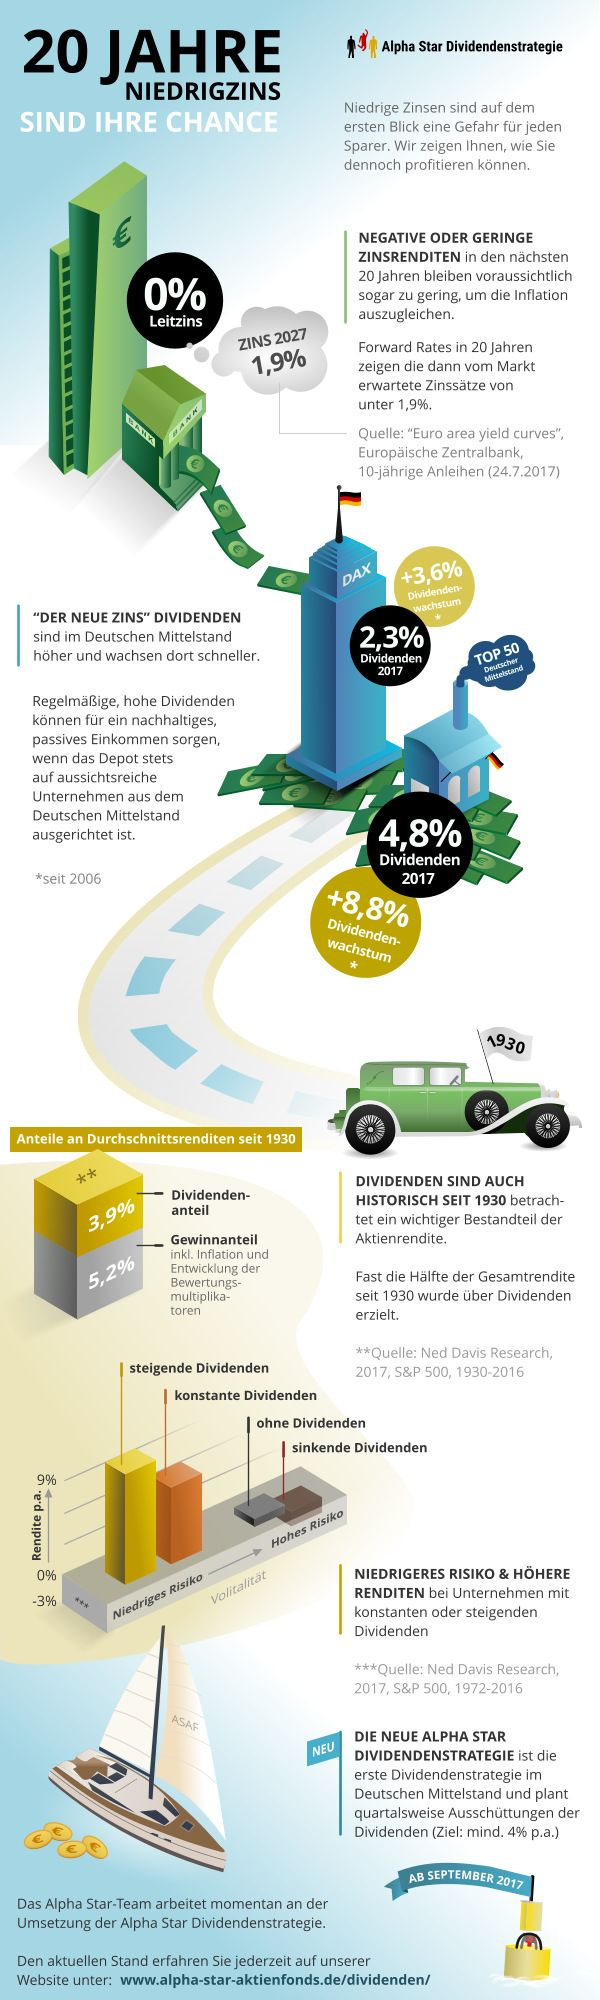 Infografik: 20 Jahre Niedrigzins